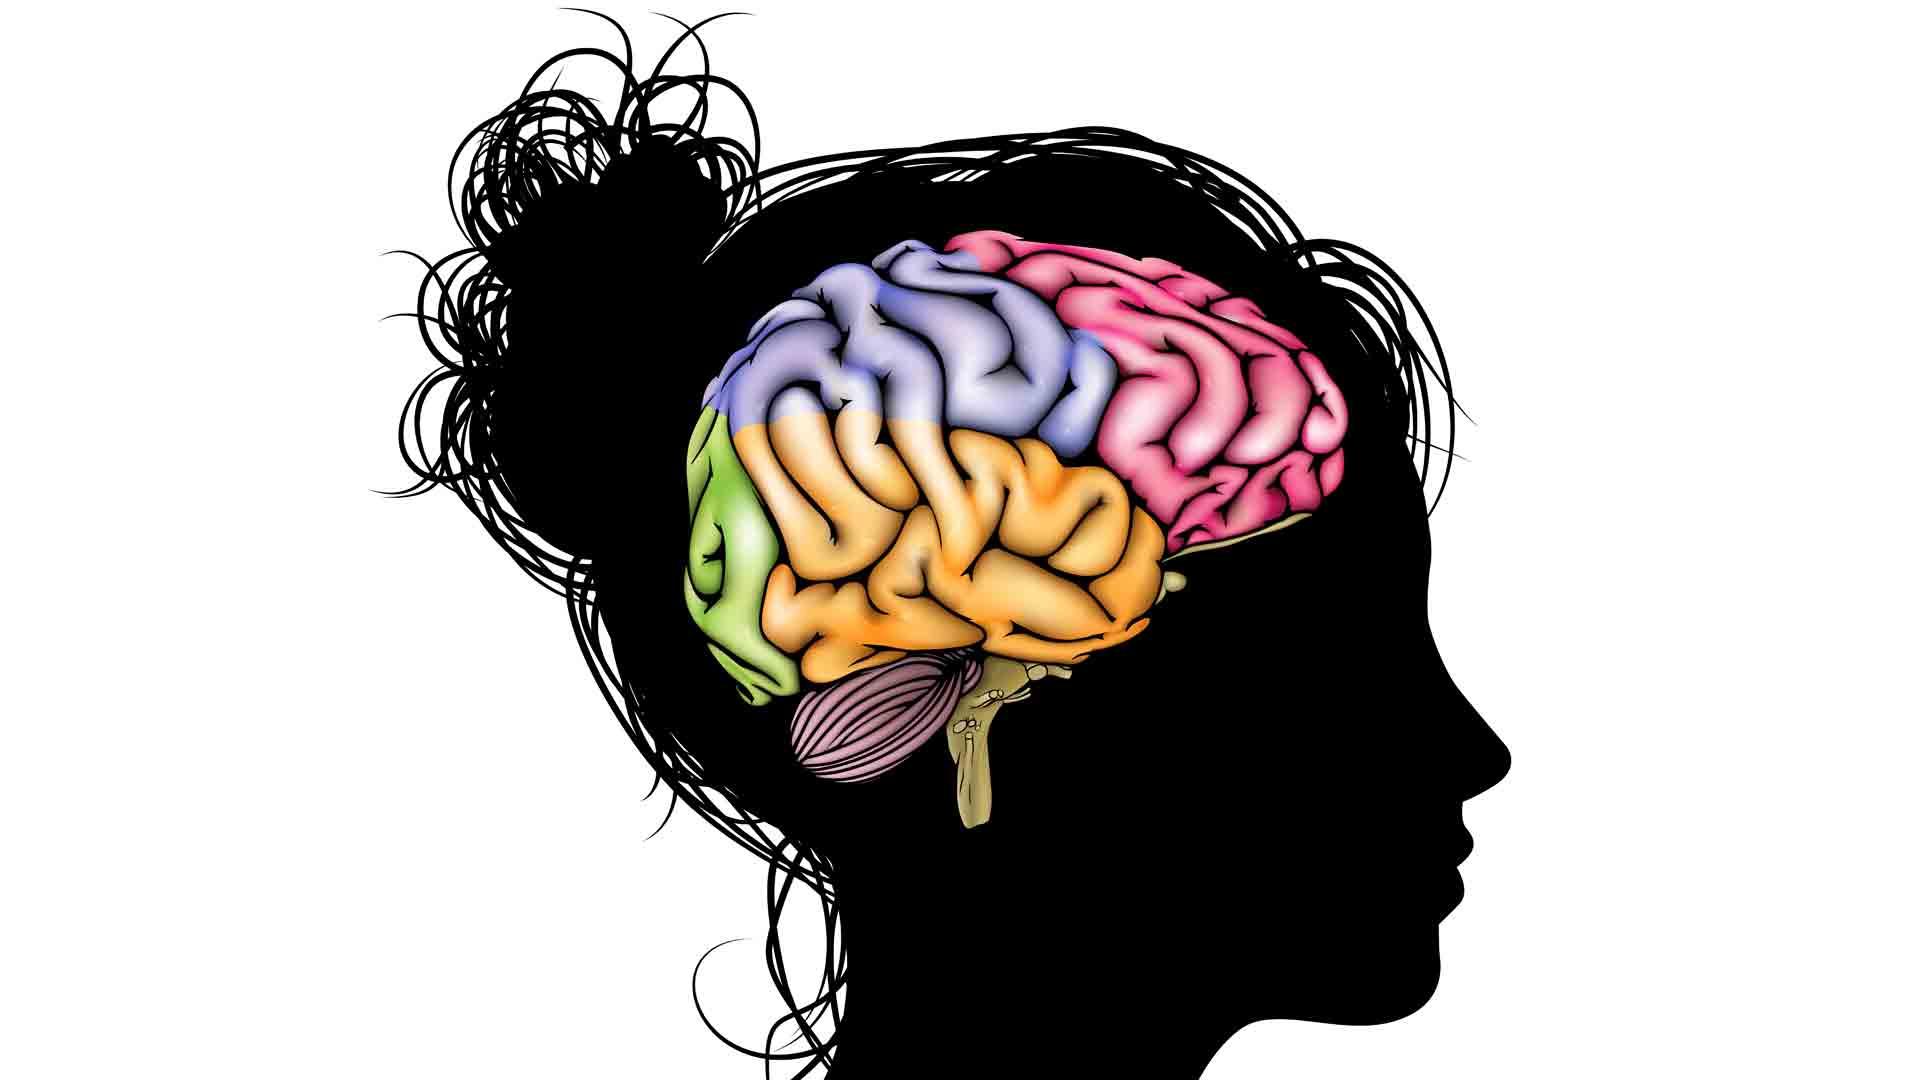 Brain #6